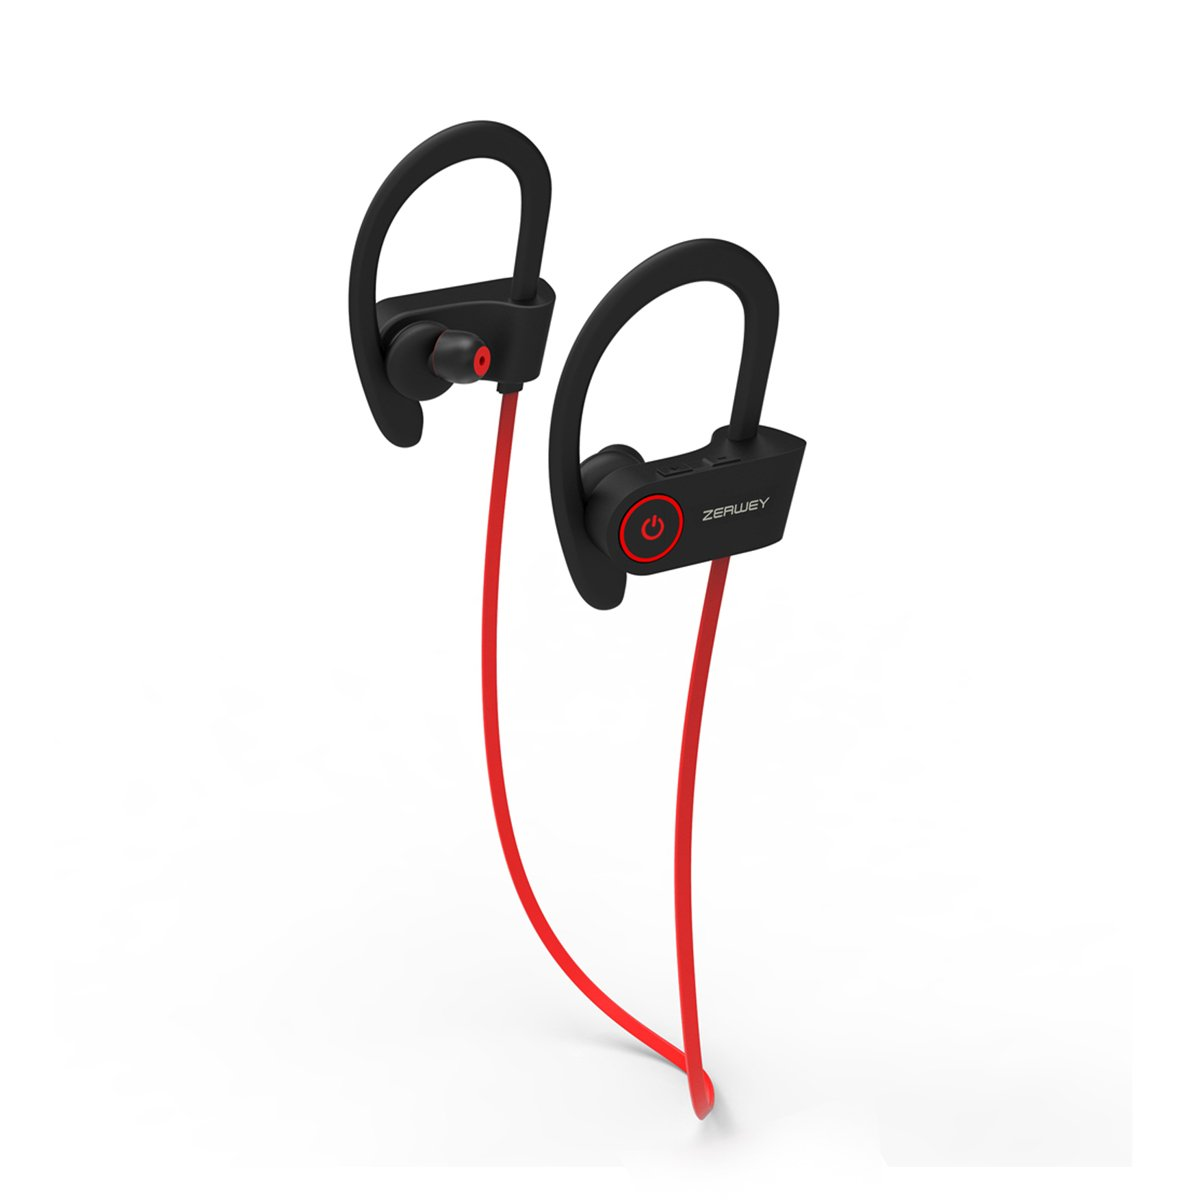 ZERWEY Bluetooth Headphones Best Wireless Sports Earphones HD Stereo Sweatproof Earbuds